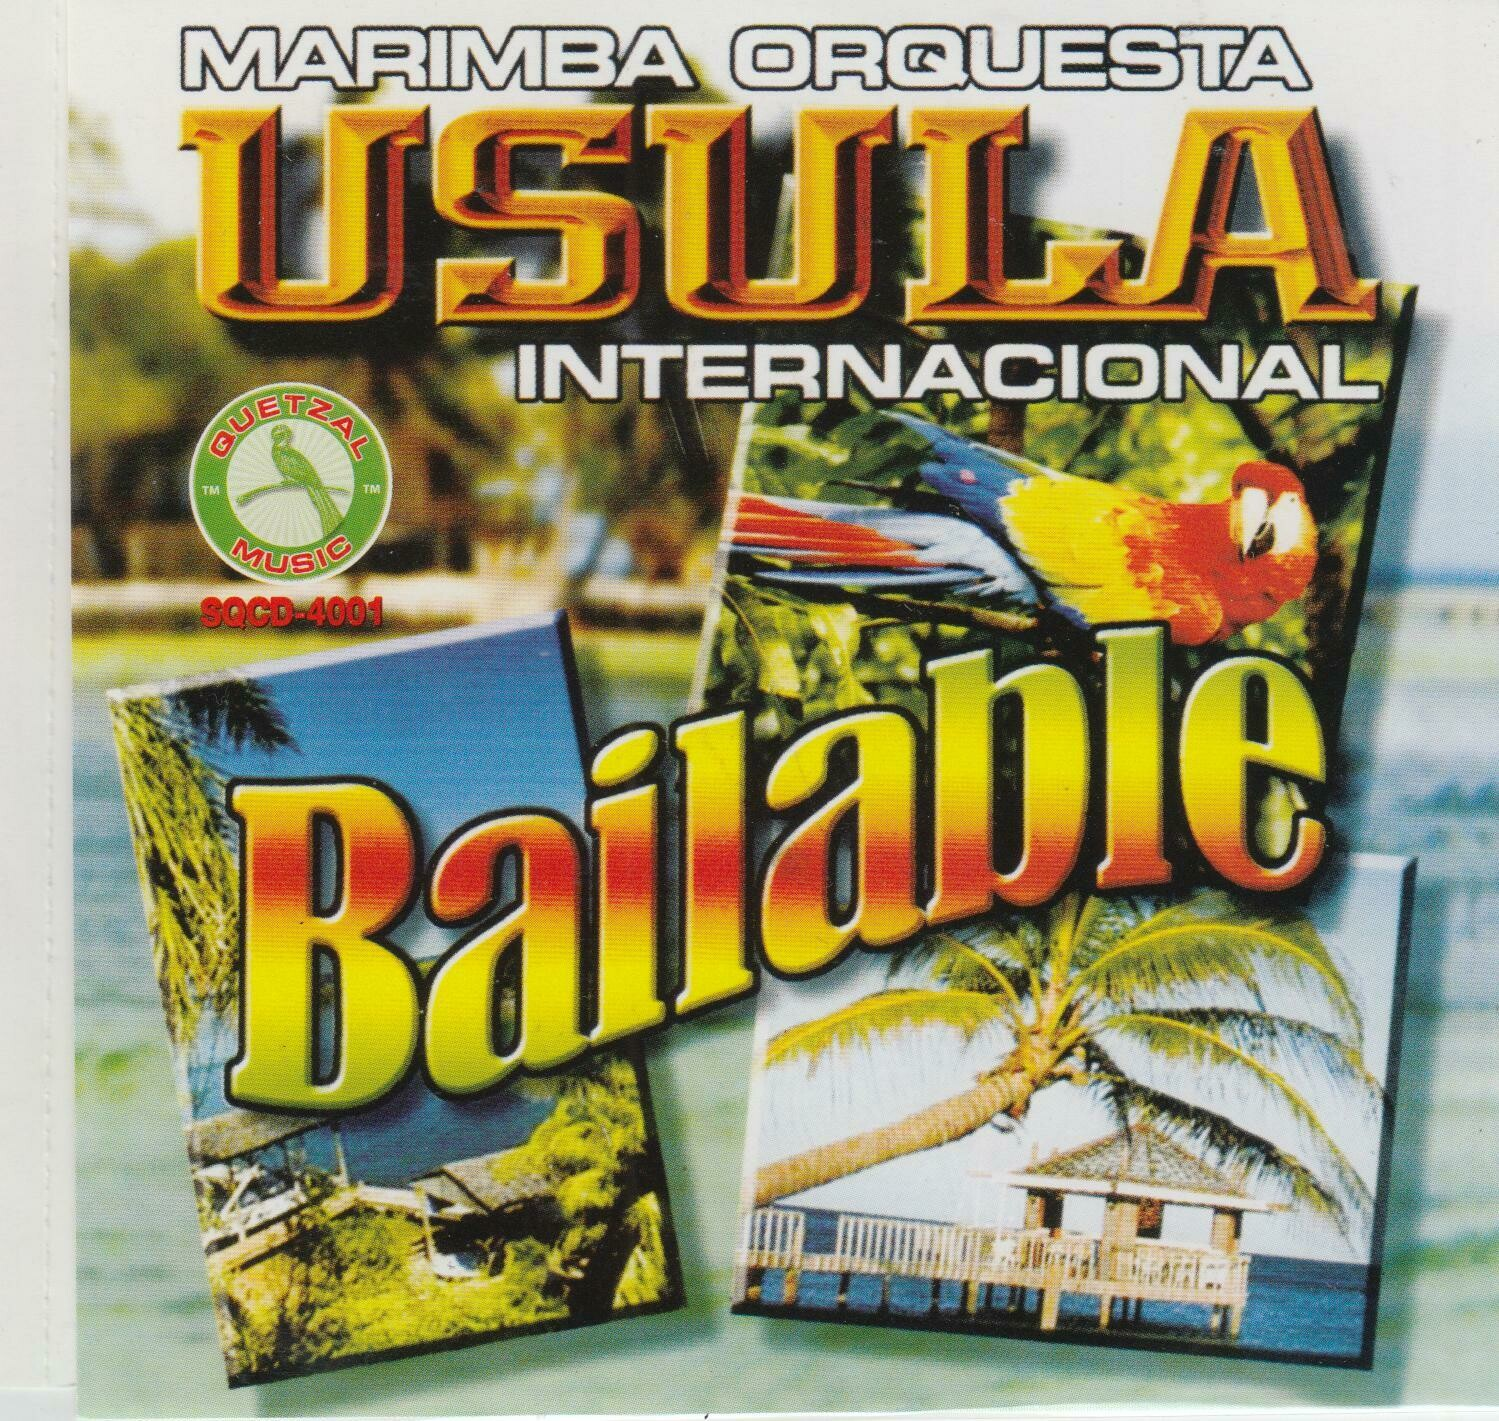 CD Marimba orquesta Usula Internacional